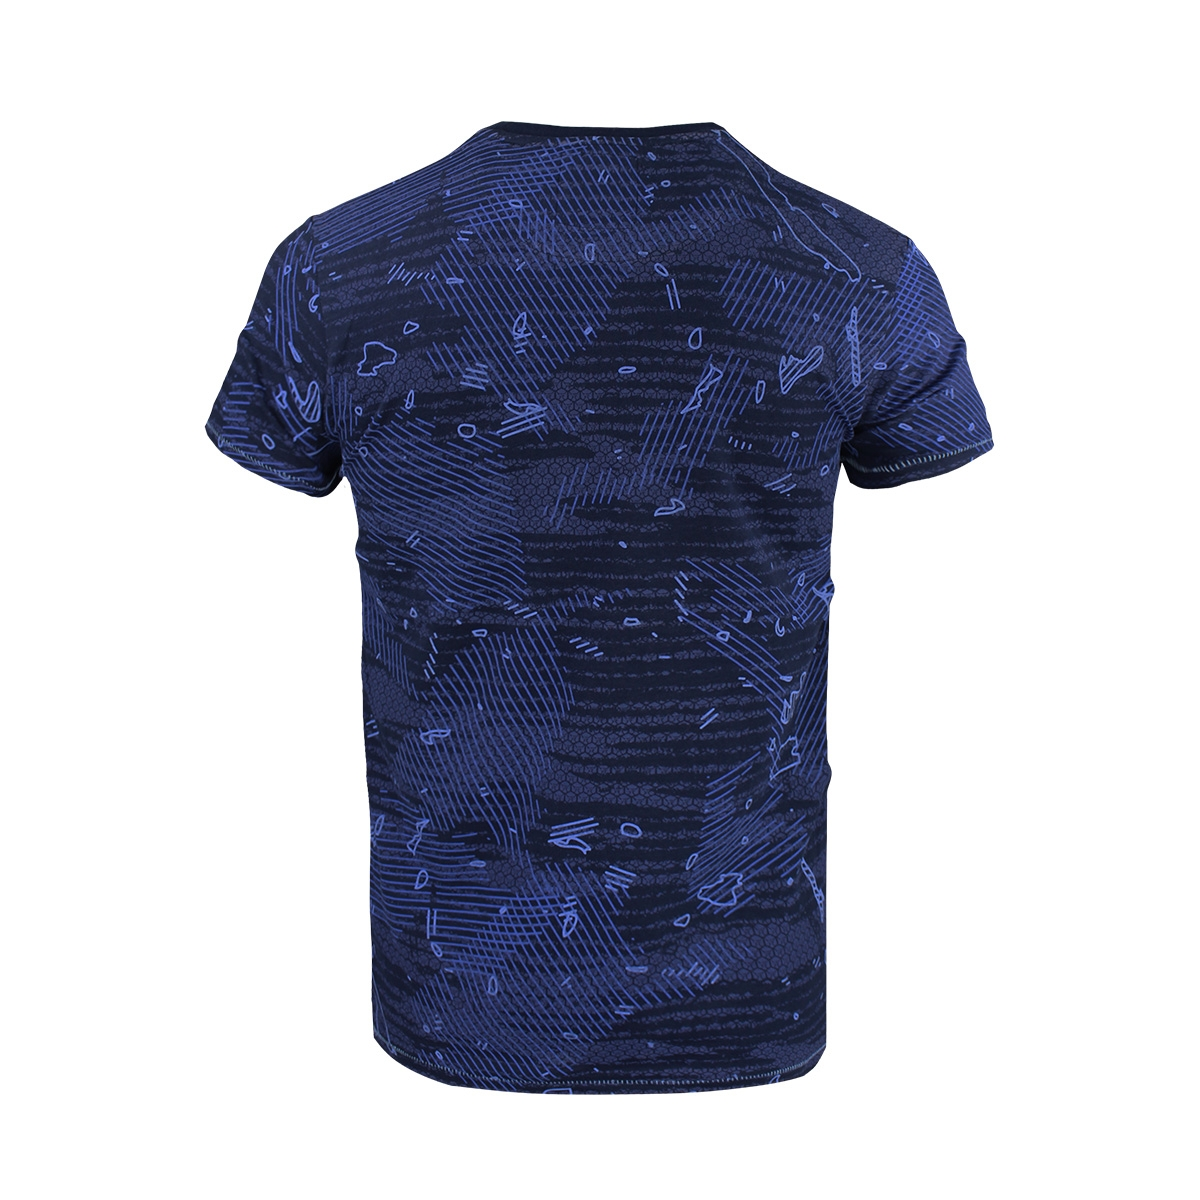 15123 gabbiano t-shirt navy